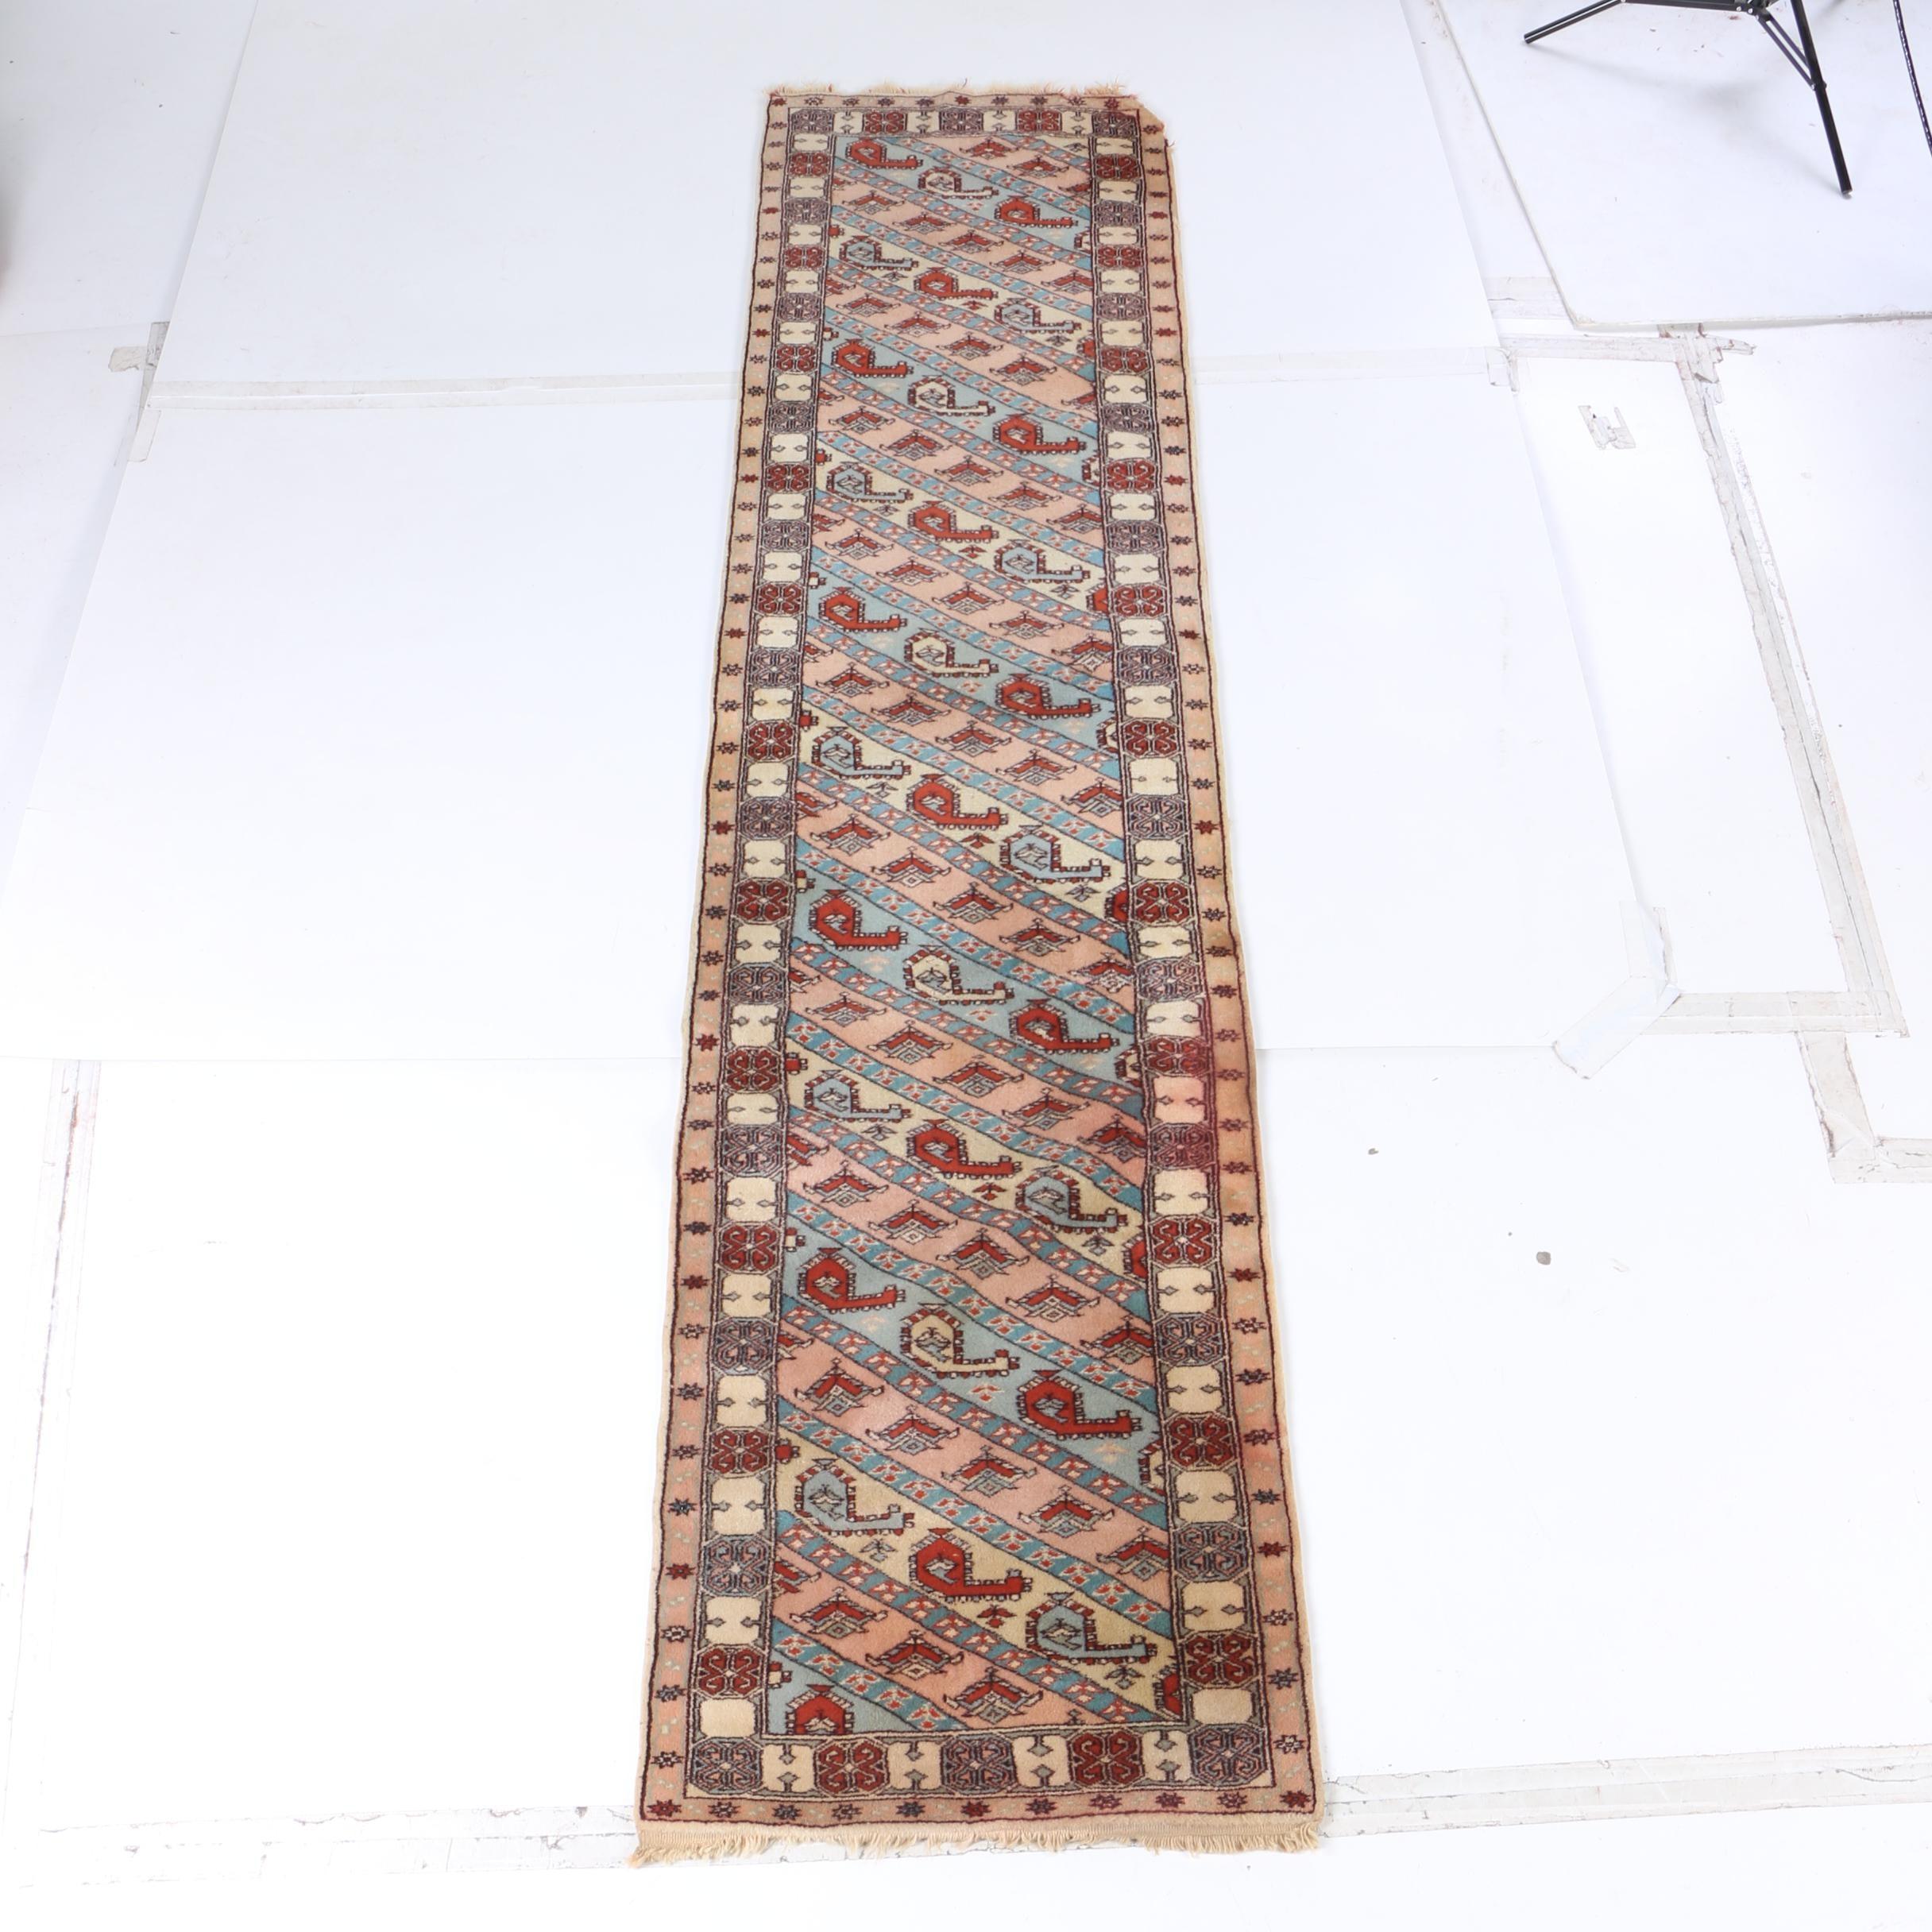 Hand-Knotted Caucasian Genje Wool Carpet Runner